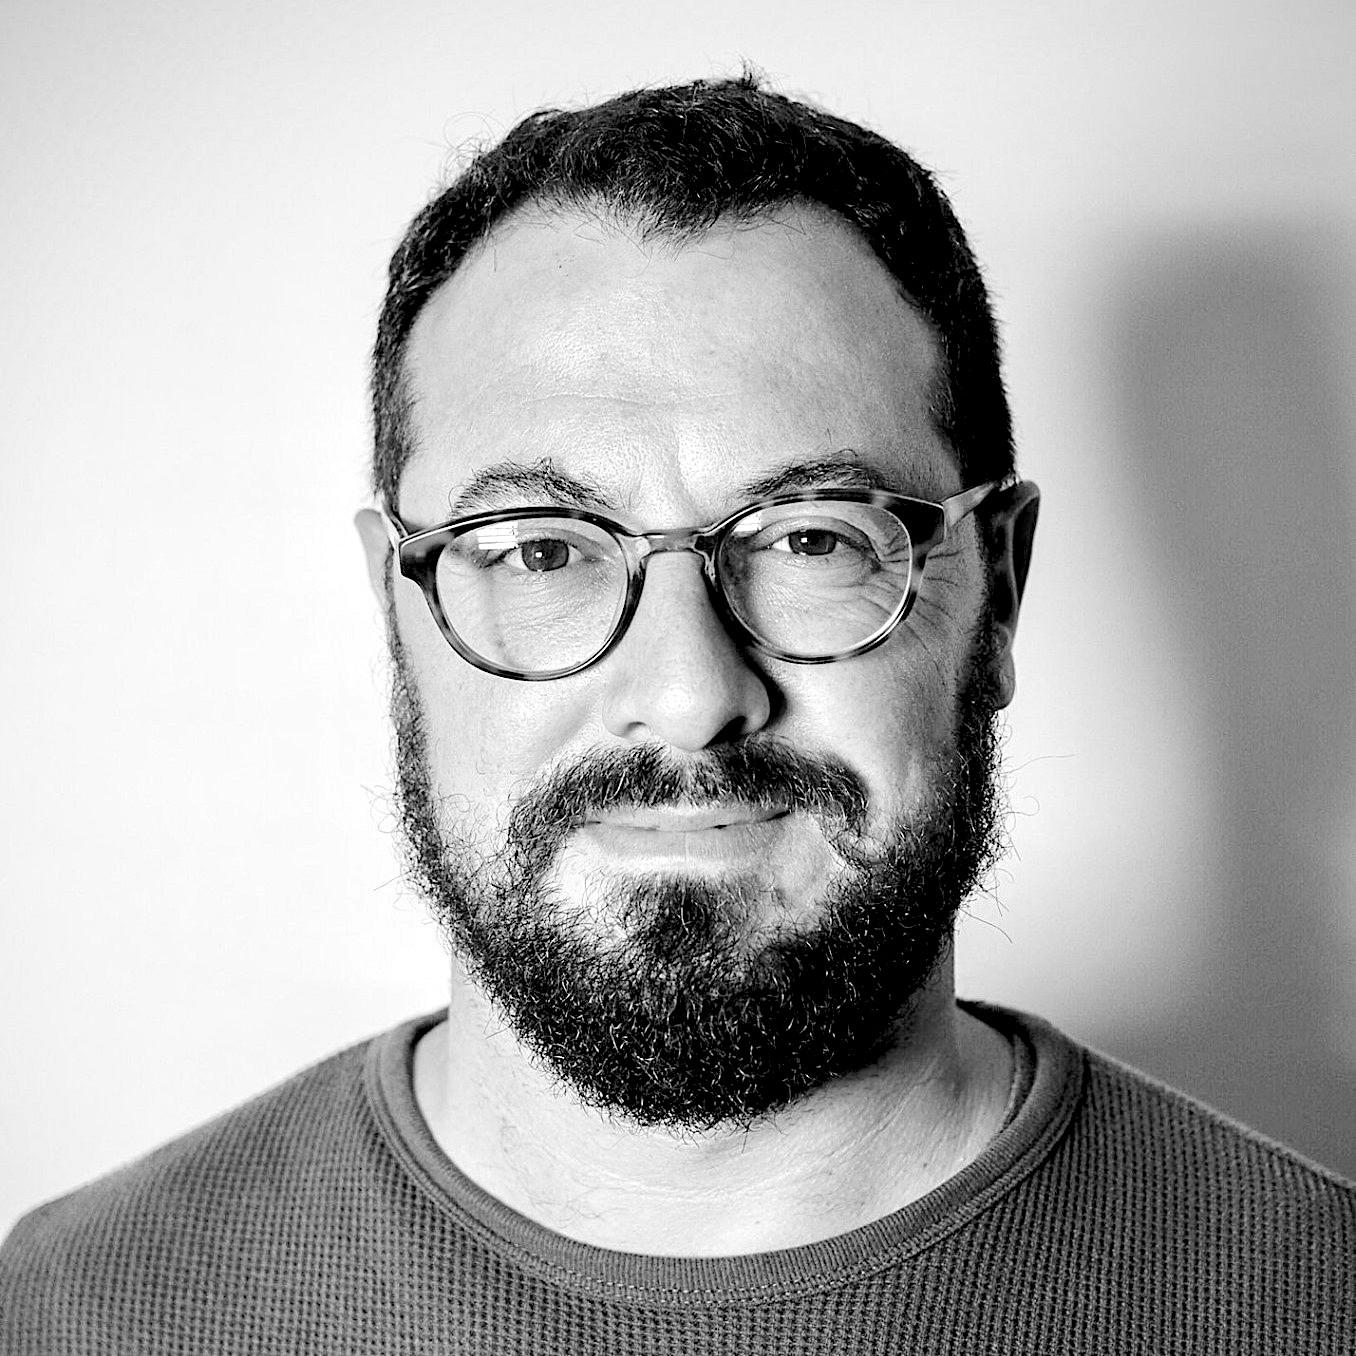 Ignacio Roizman Communitana Founder